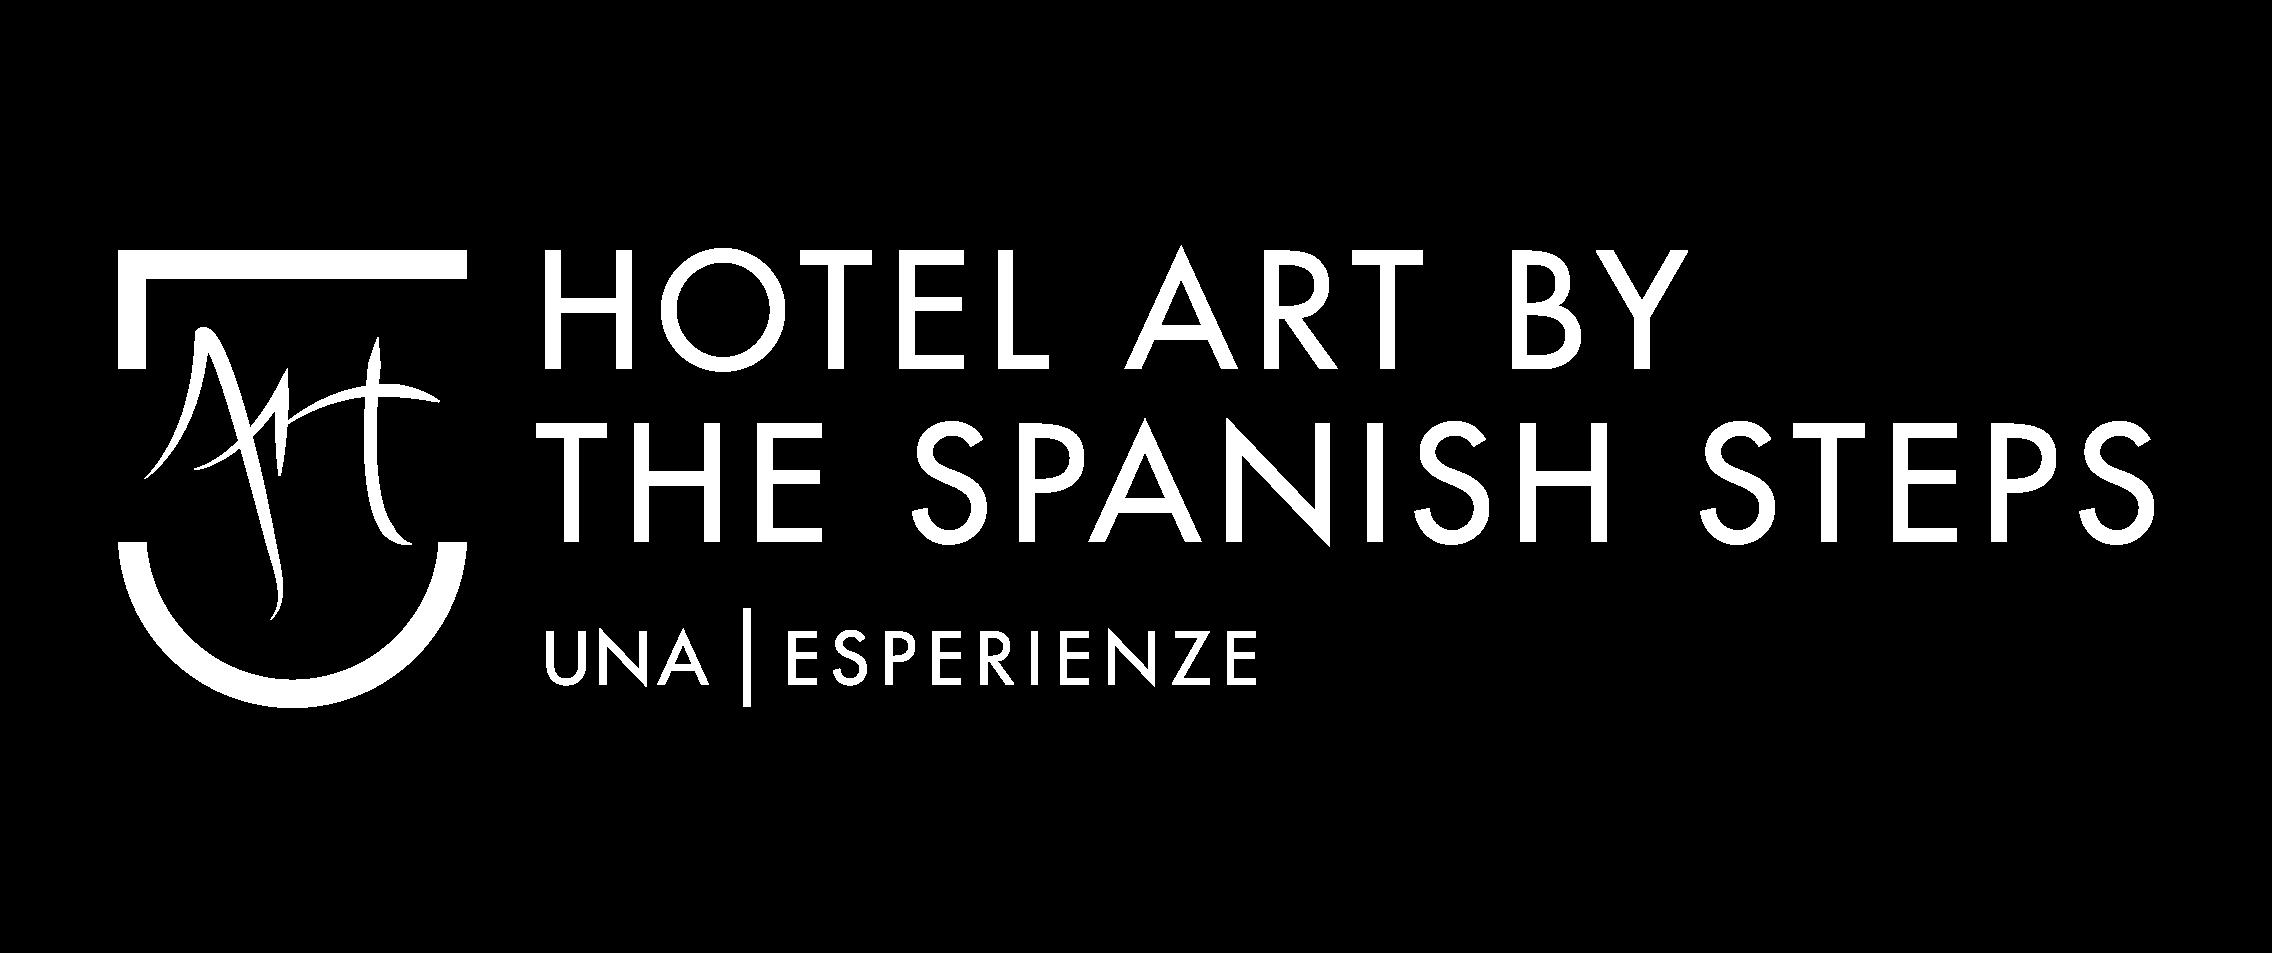 Hotel Art by the Spanish Steps UNA Esperienze